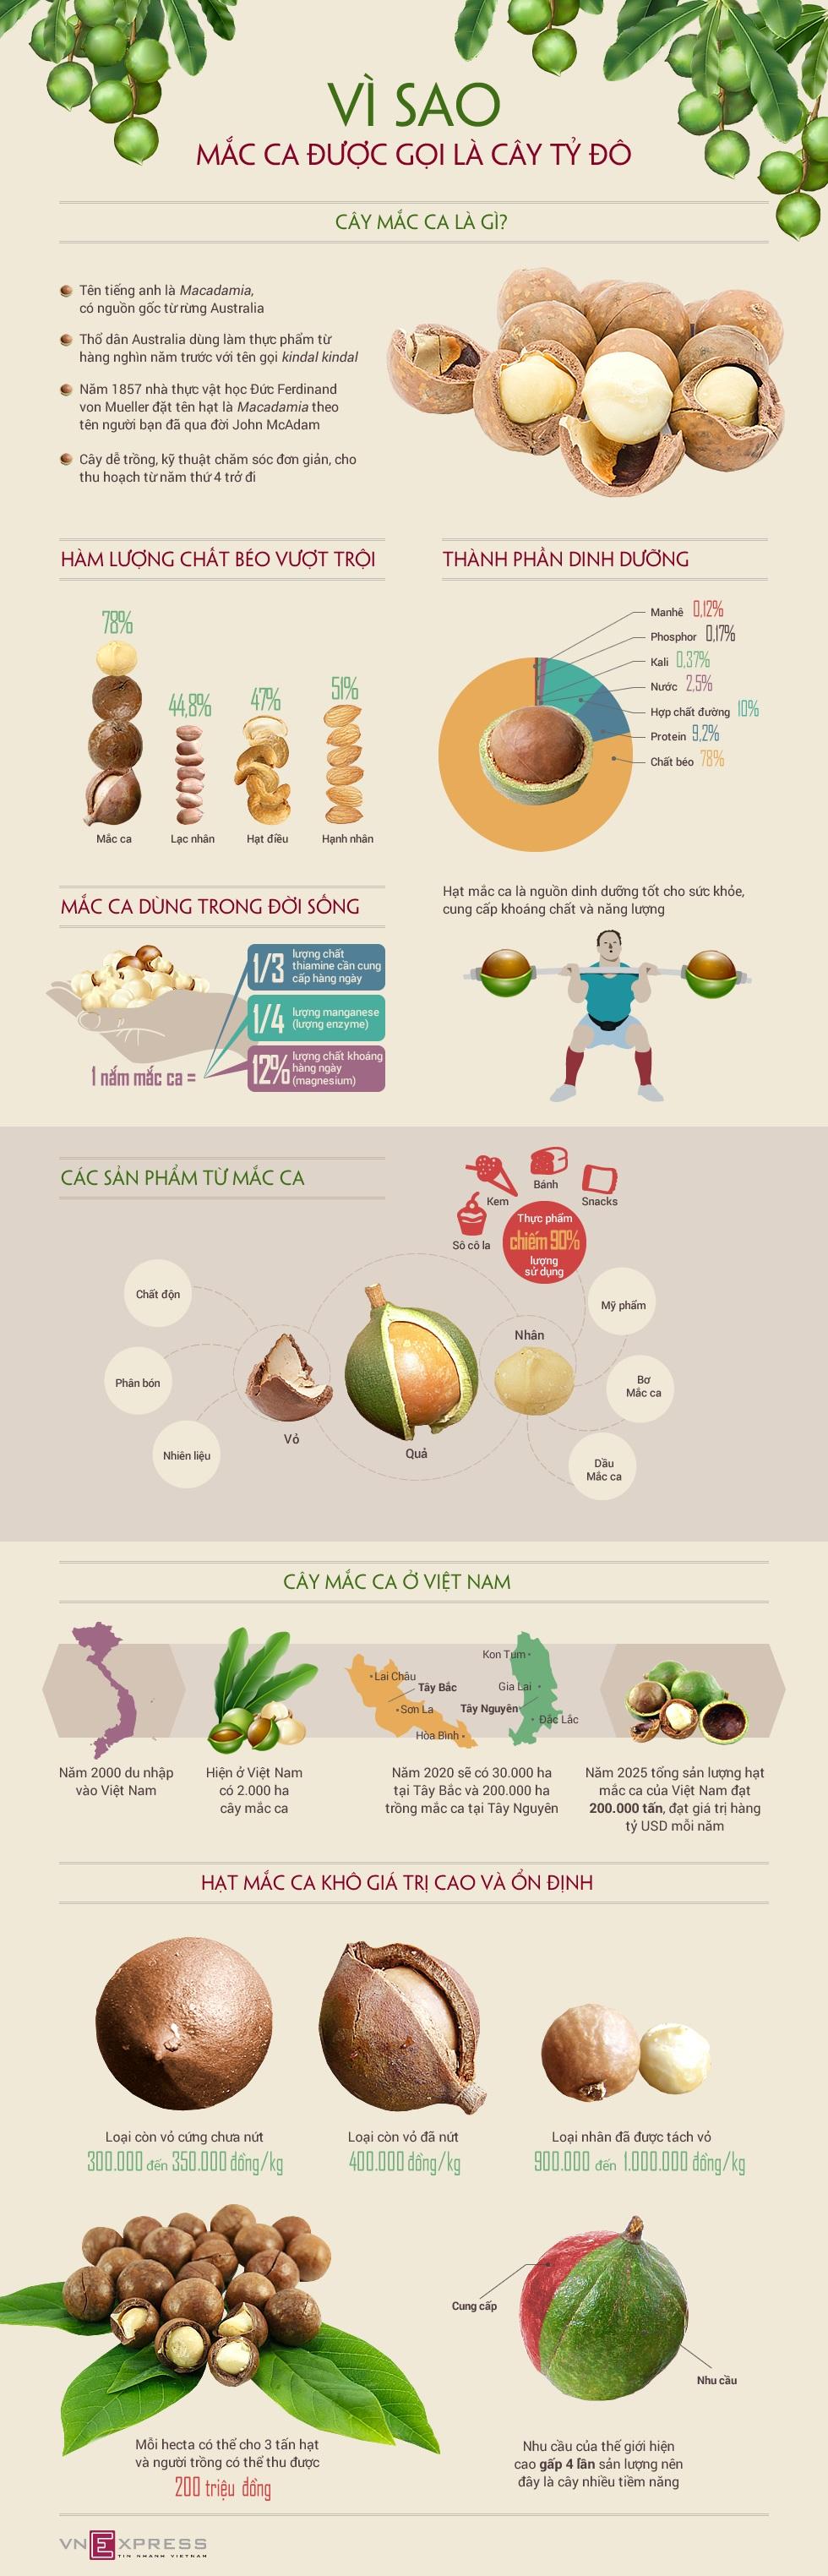 Infographic - Hạt Mắc-Ca